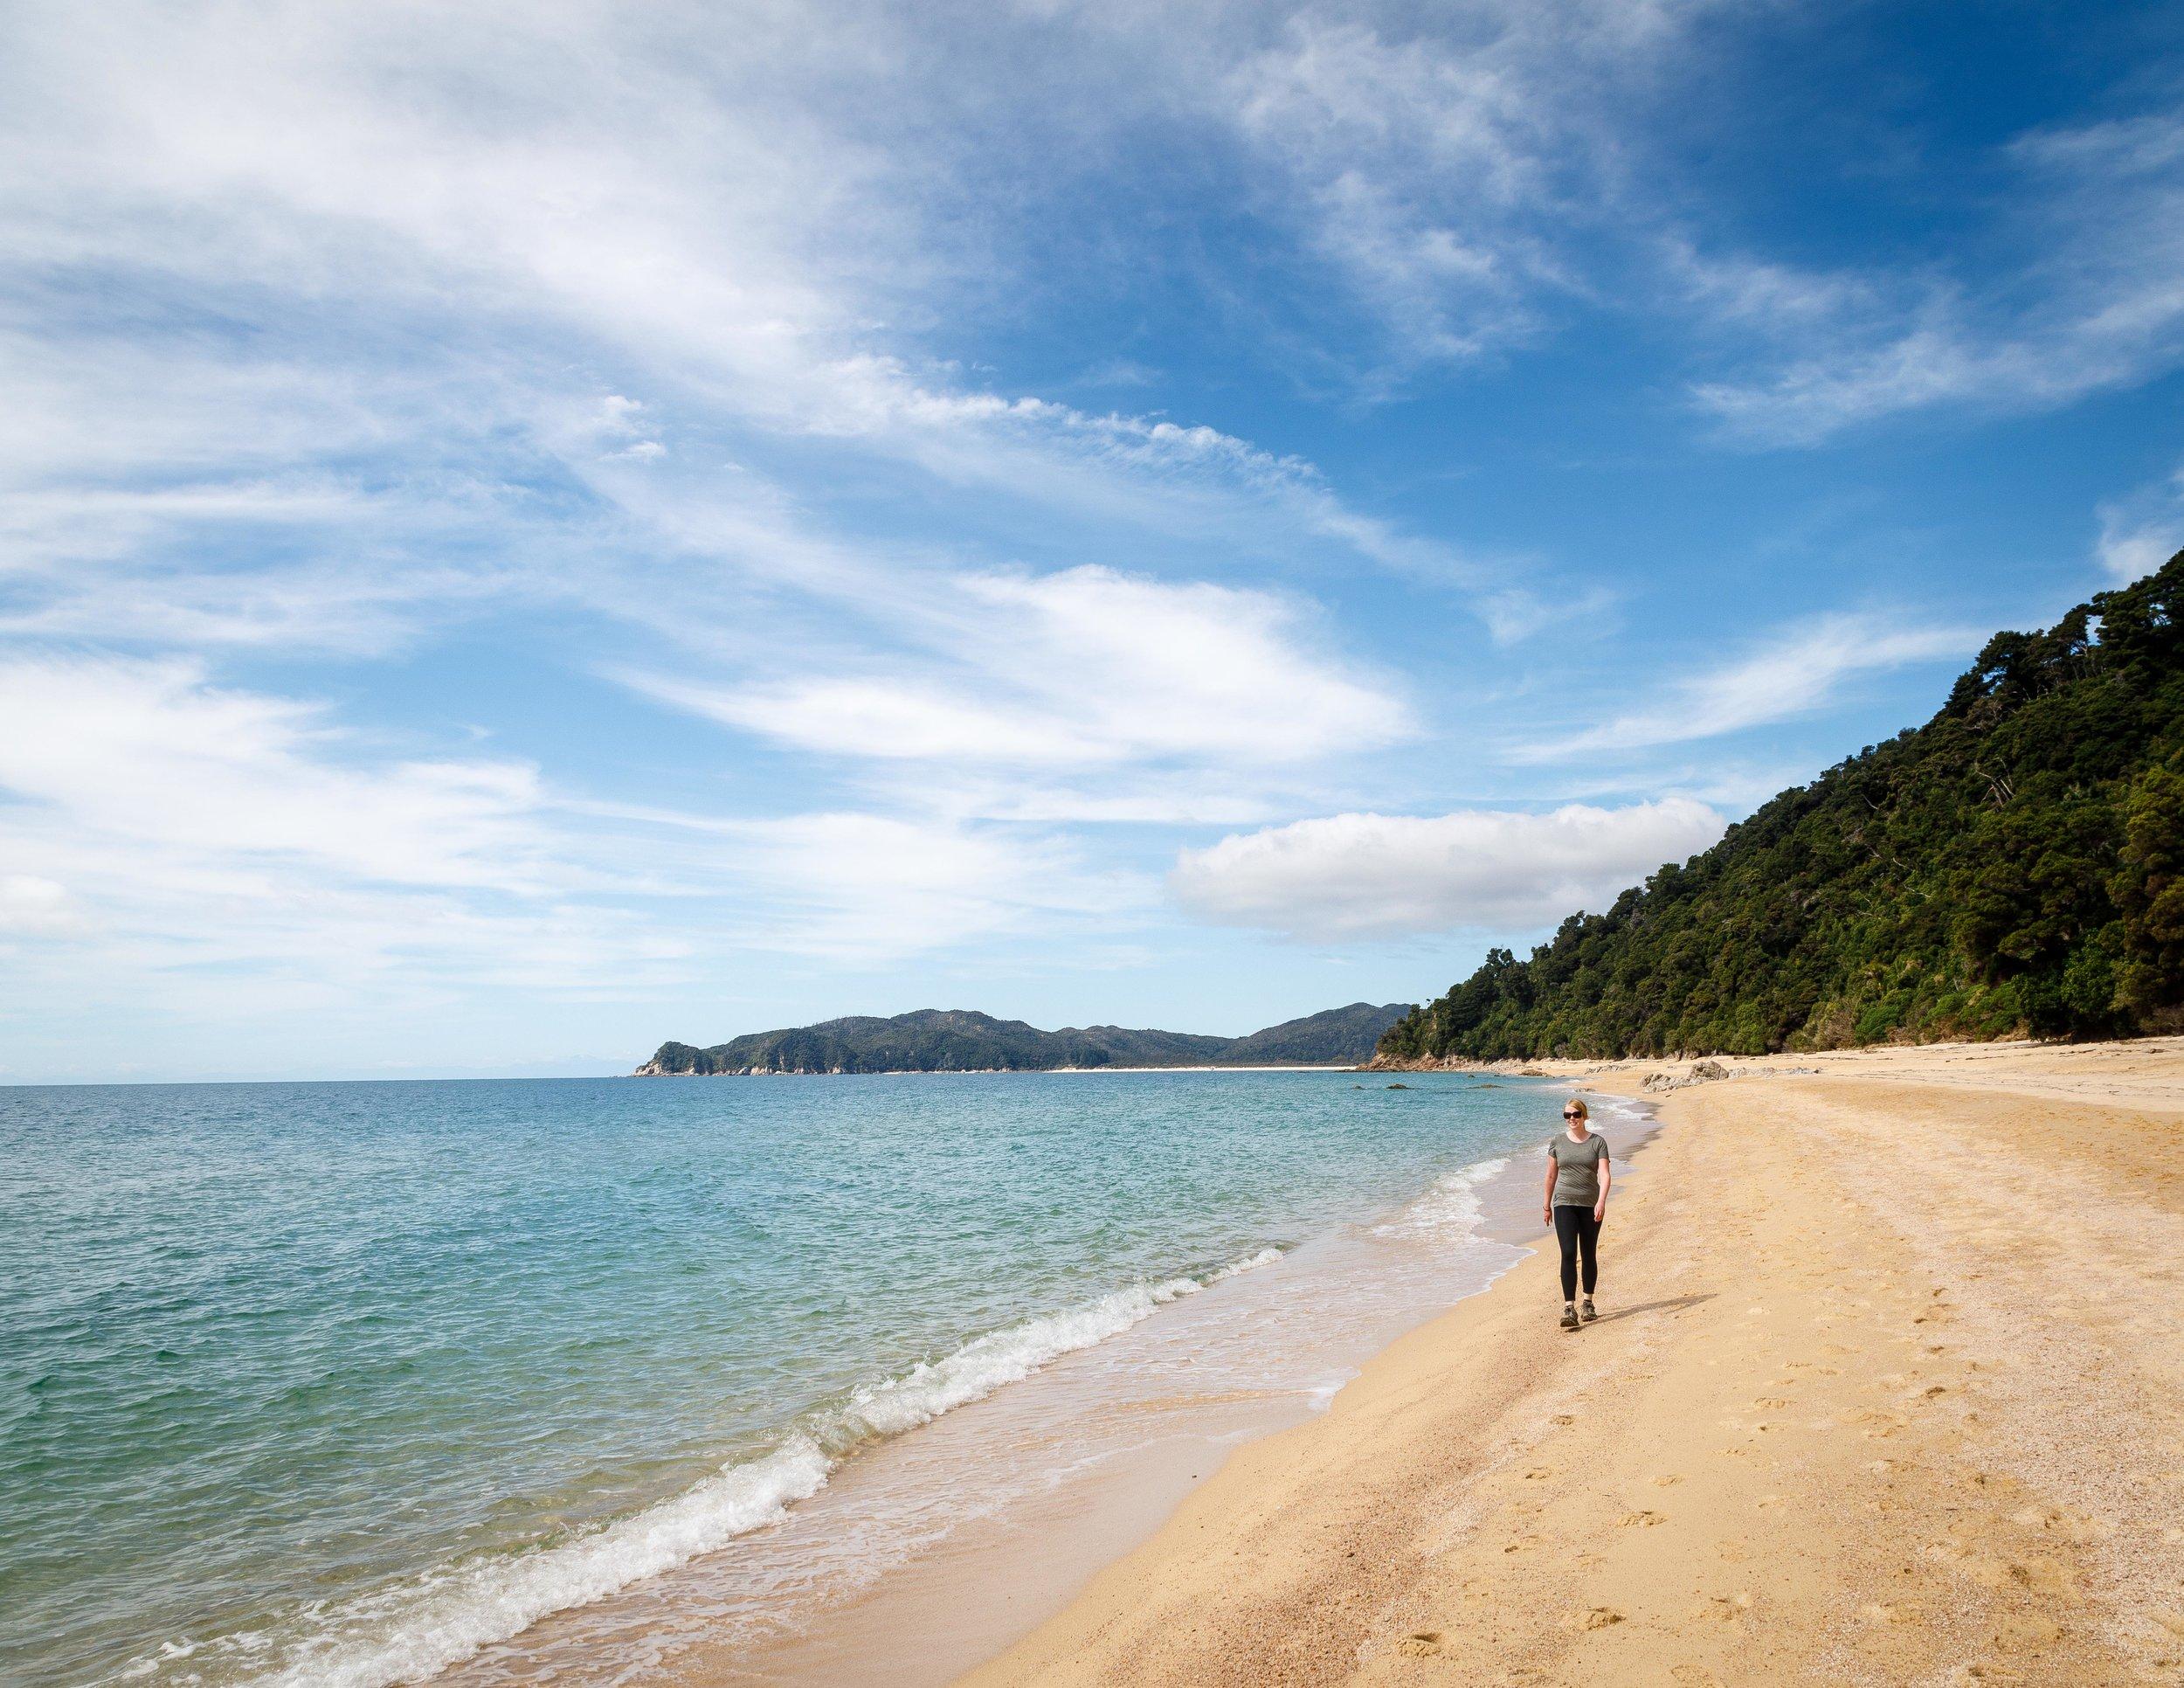 Goat Bay, the track crosses so many wonderful beaches